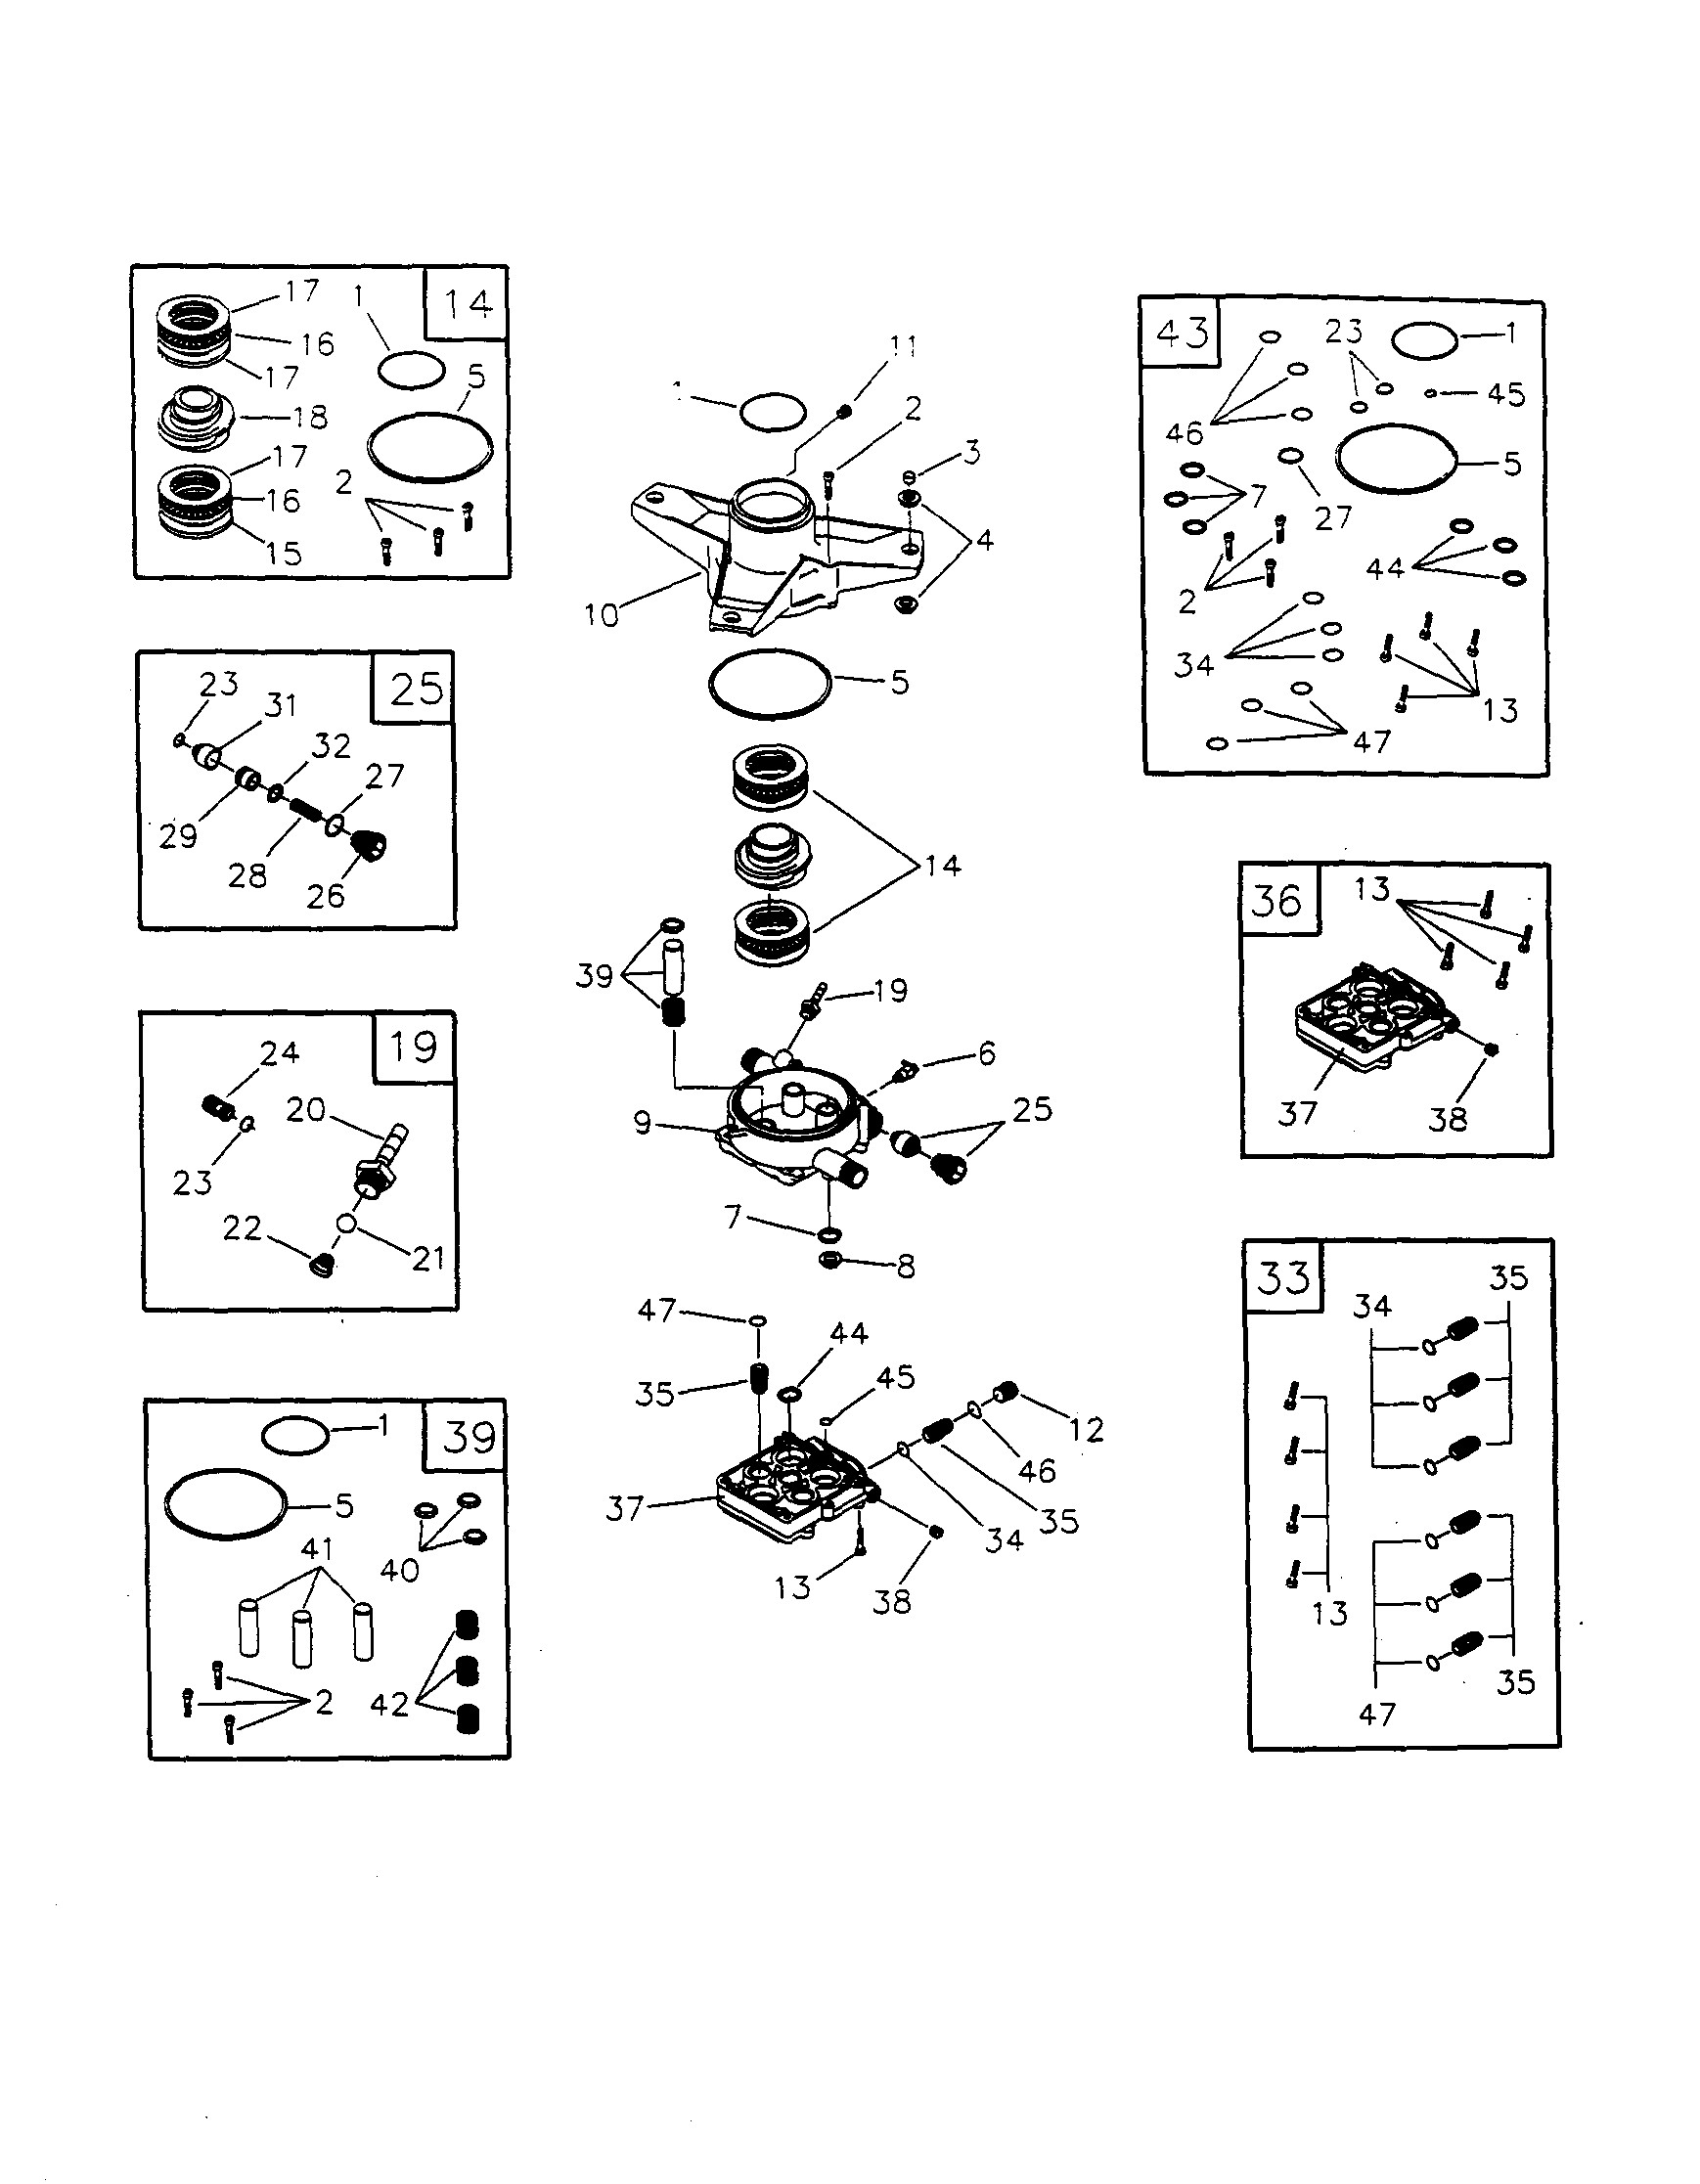 Honda Gc160 Parts Diagram Craftsman Model Power Washer Gas Genuine Parts Of Honda Gc160 Parts Diagram